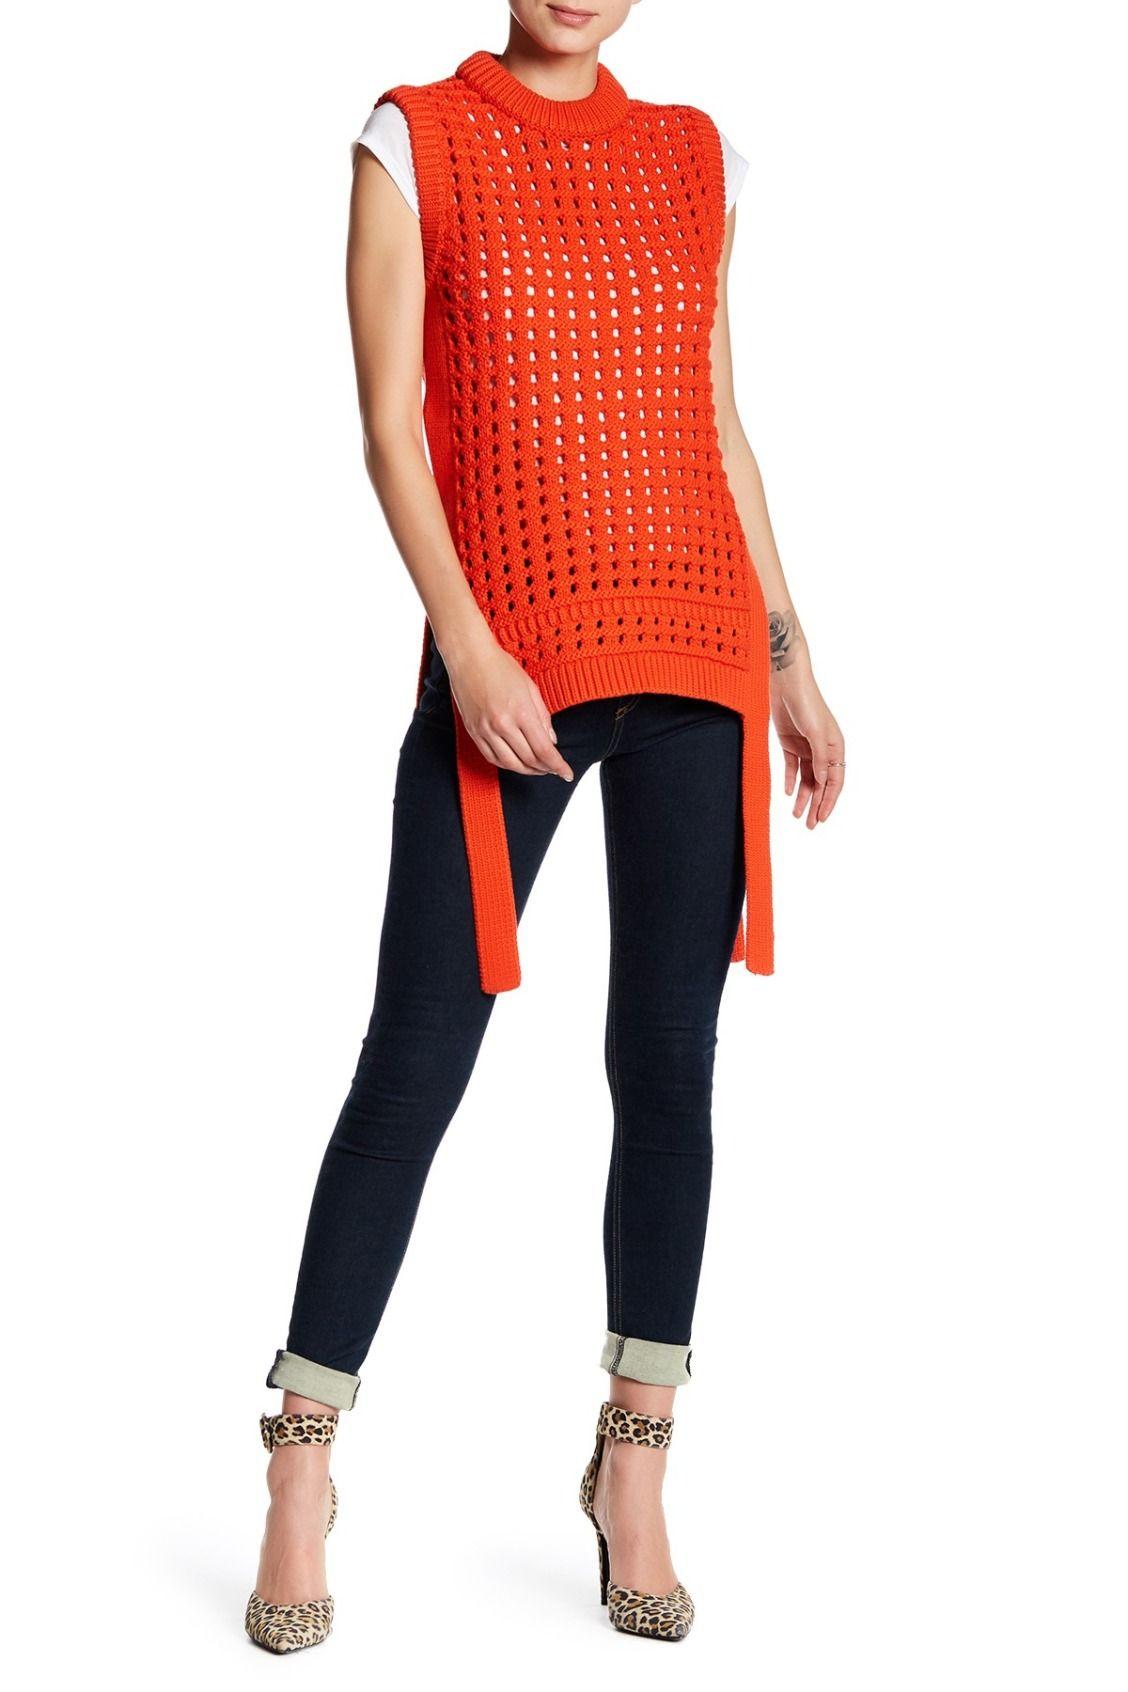 177a438e72cb Beautiful Scarlet Red tibi Pointelle Sleeveless Sweater Crochet Top,  Tankini, Capri Pants, Sweaters